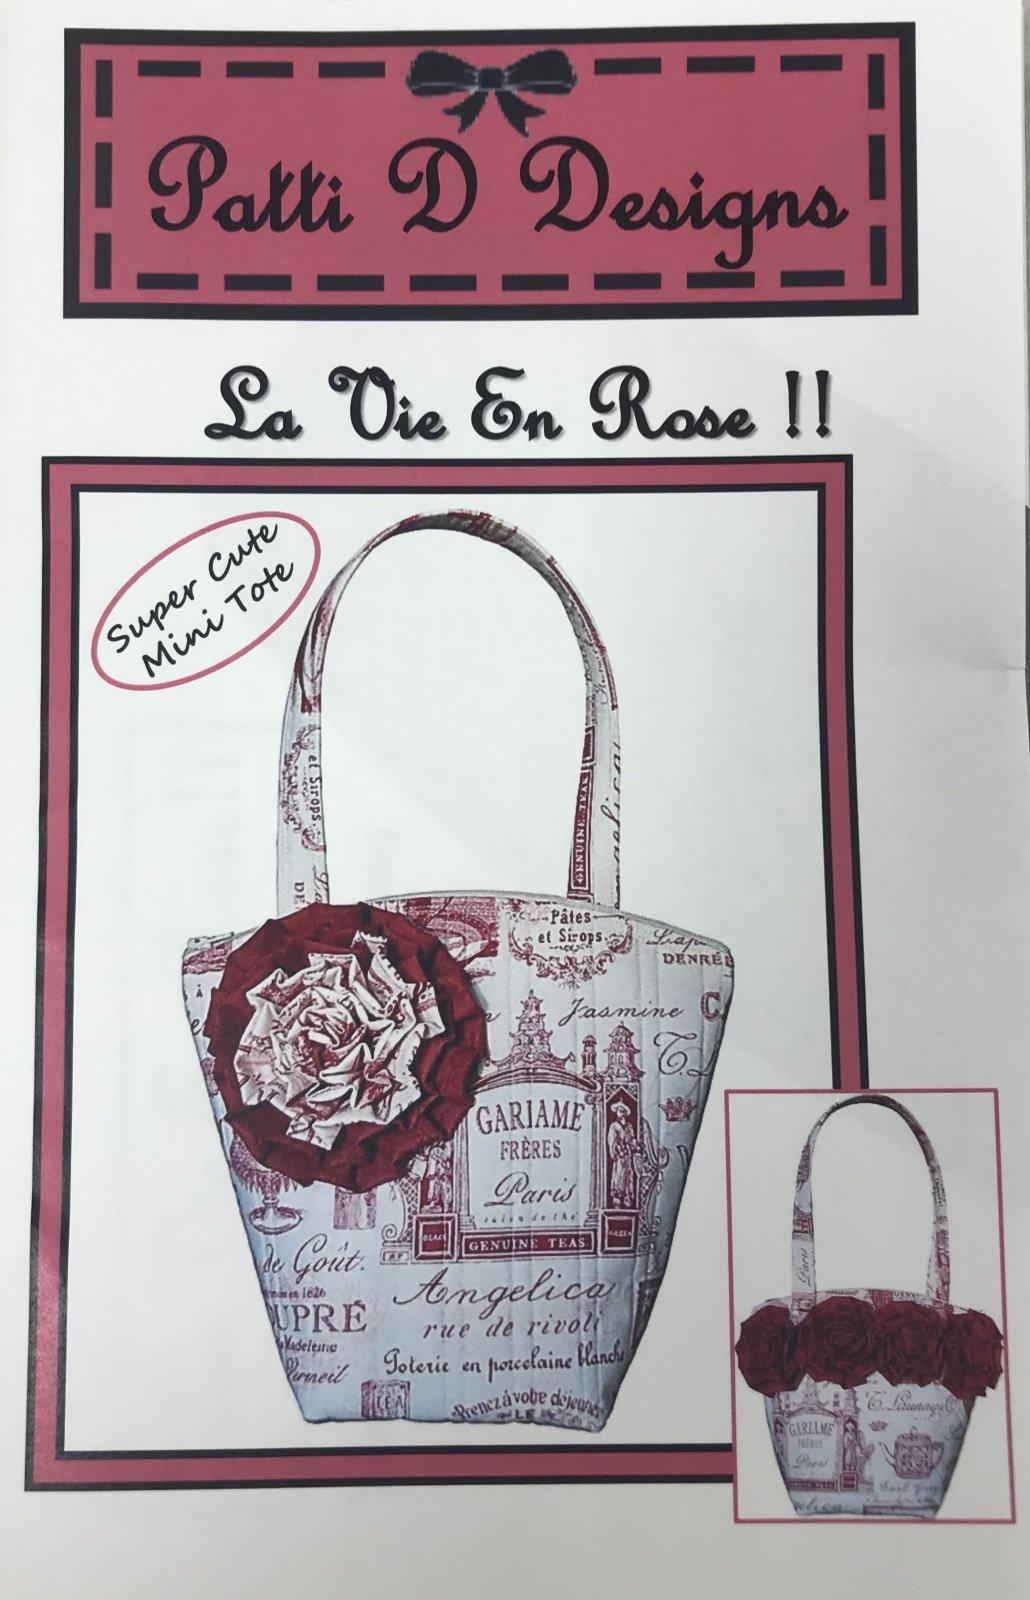 Pattern Patti D Designs La Vie En Rose